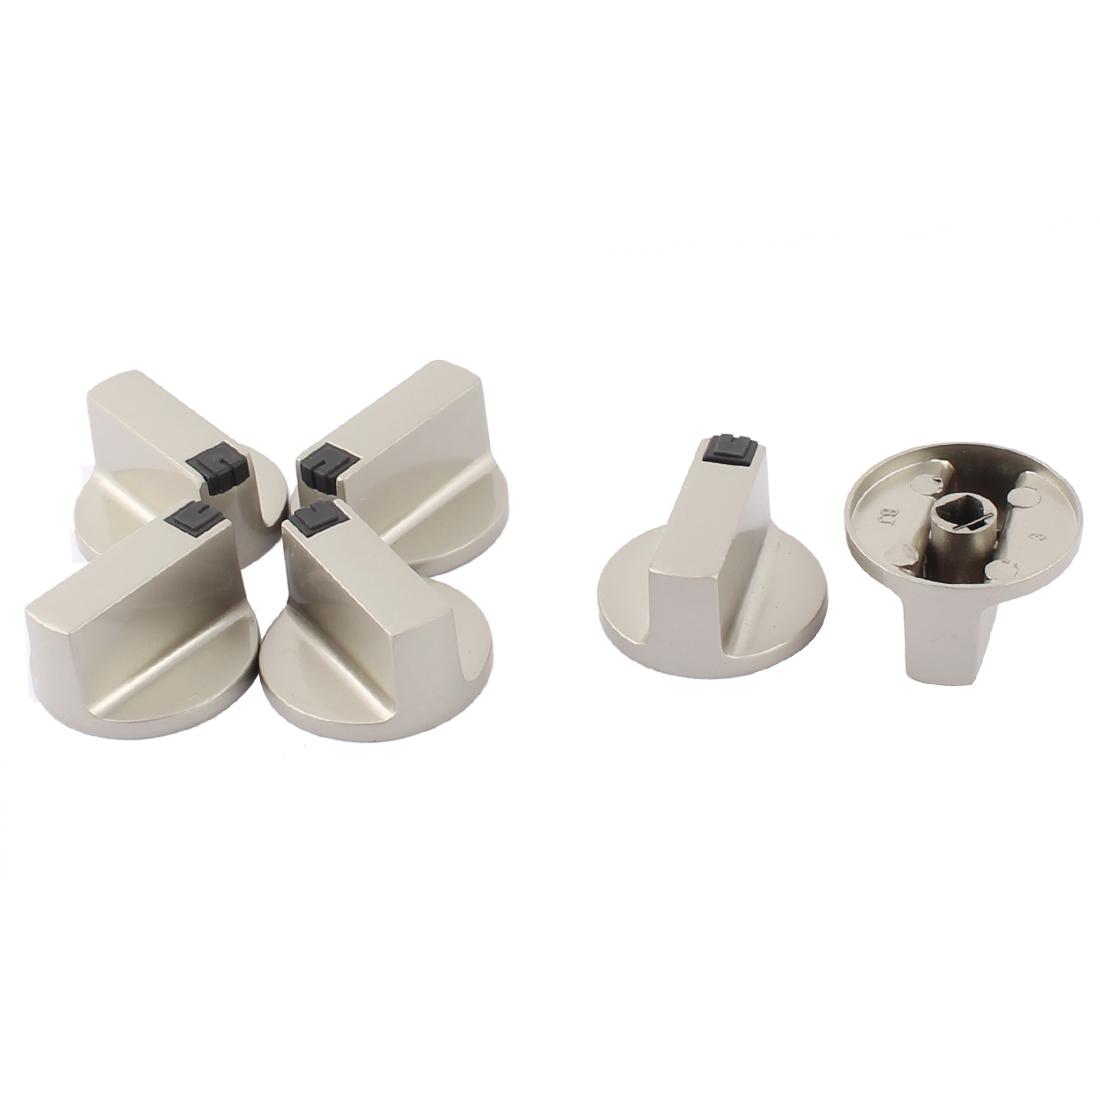 Kitchen Gas Stove Oven Alloy Bevel Hole Design Rotary Switch Range Knob 4cm Dia 6pcs